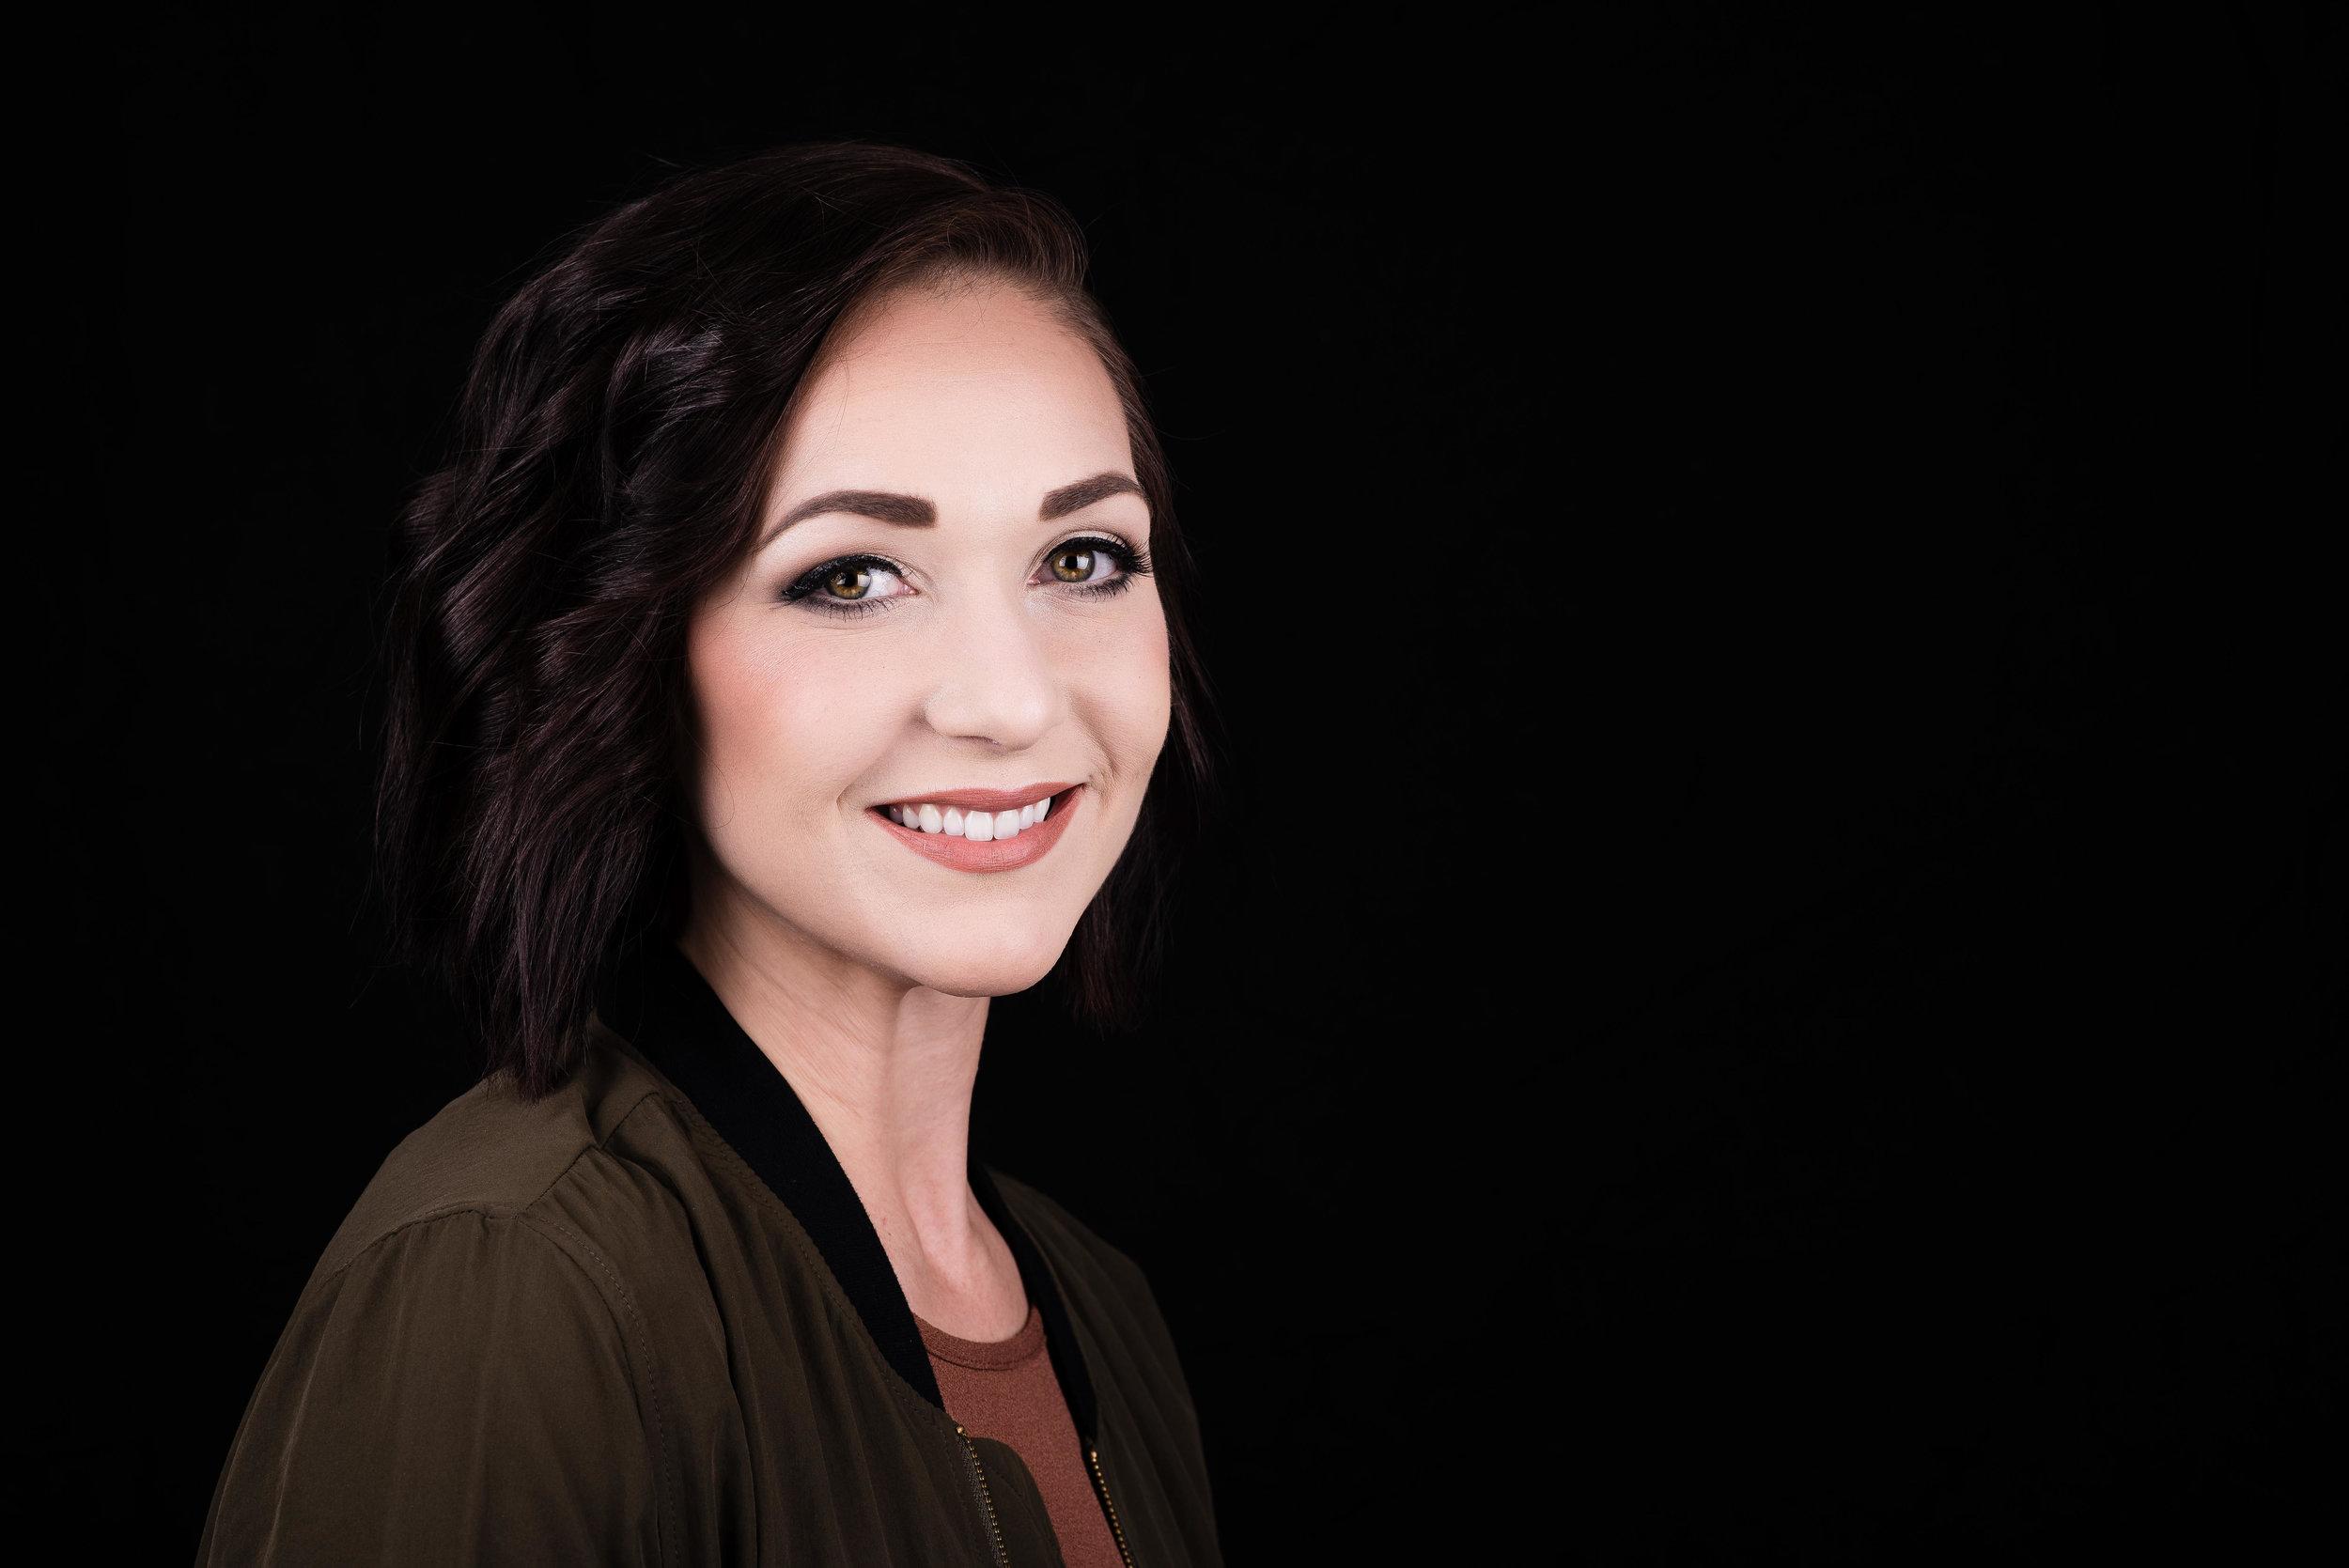 Professional Portraits - Professional Photos and Headshots for Passport, LinkedIn, Resume, etc